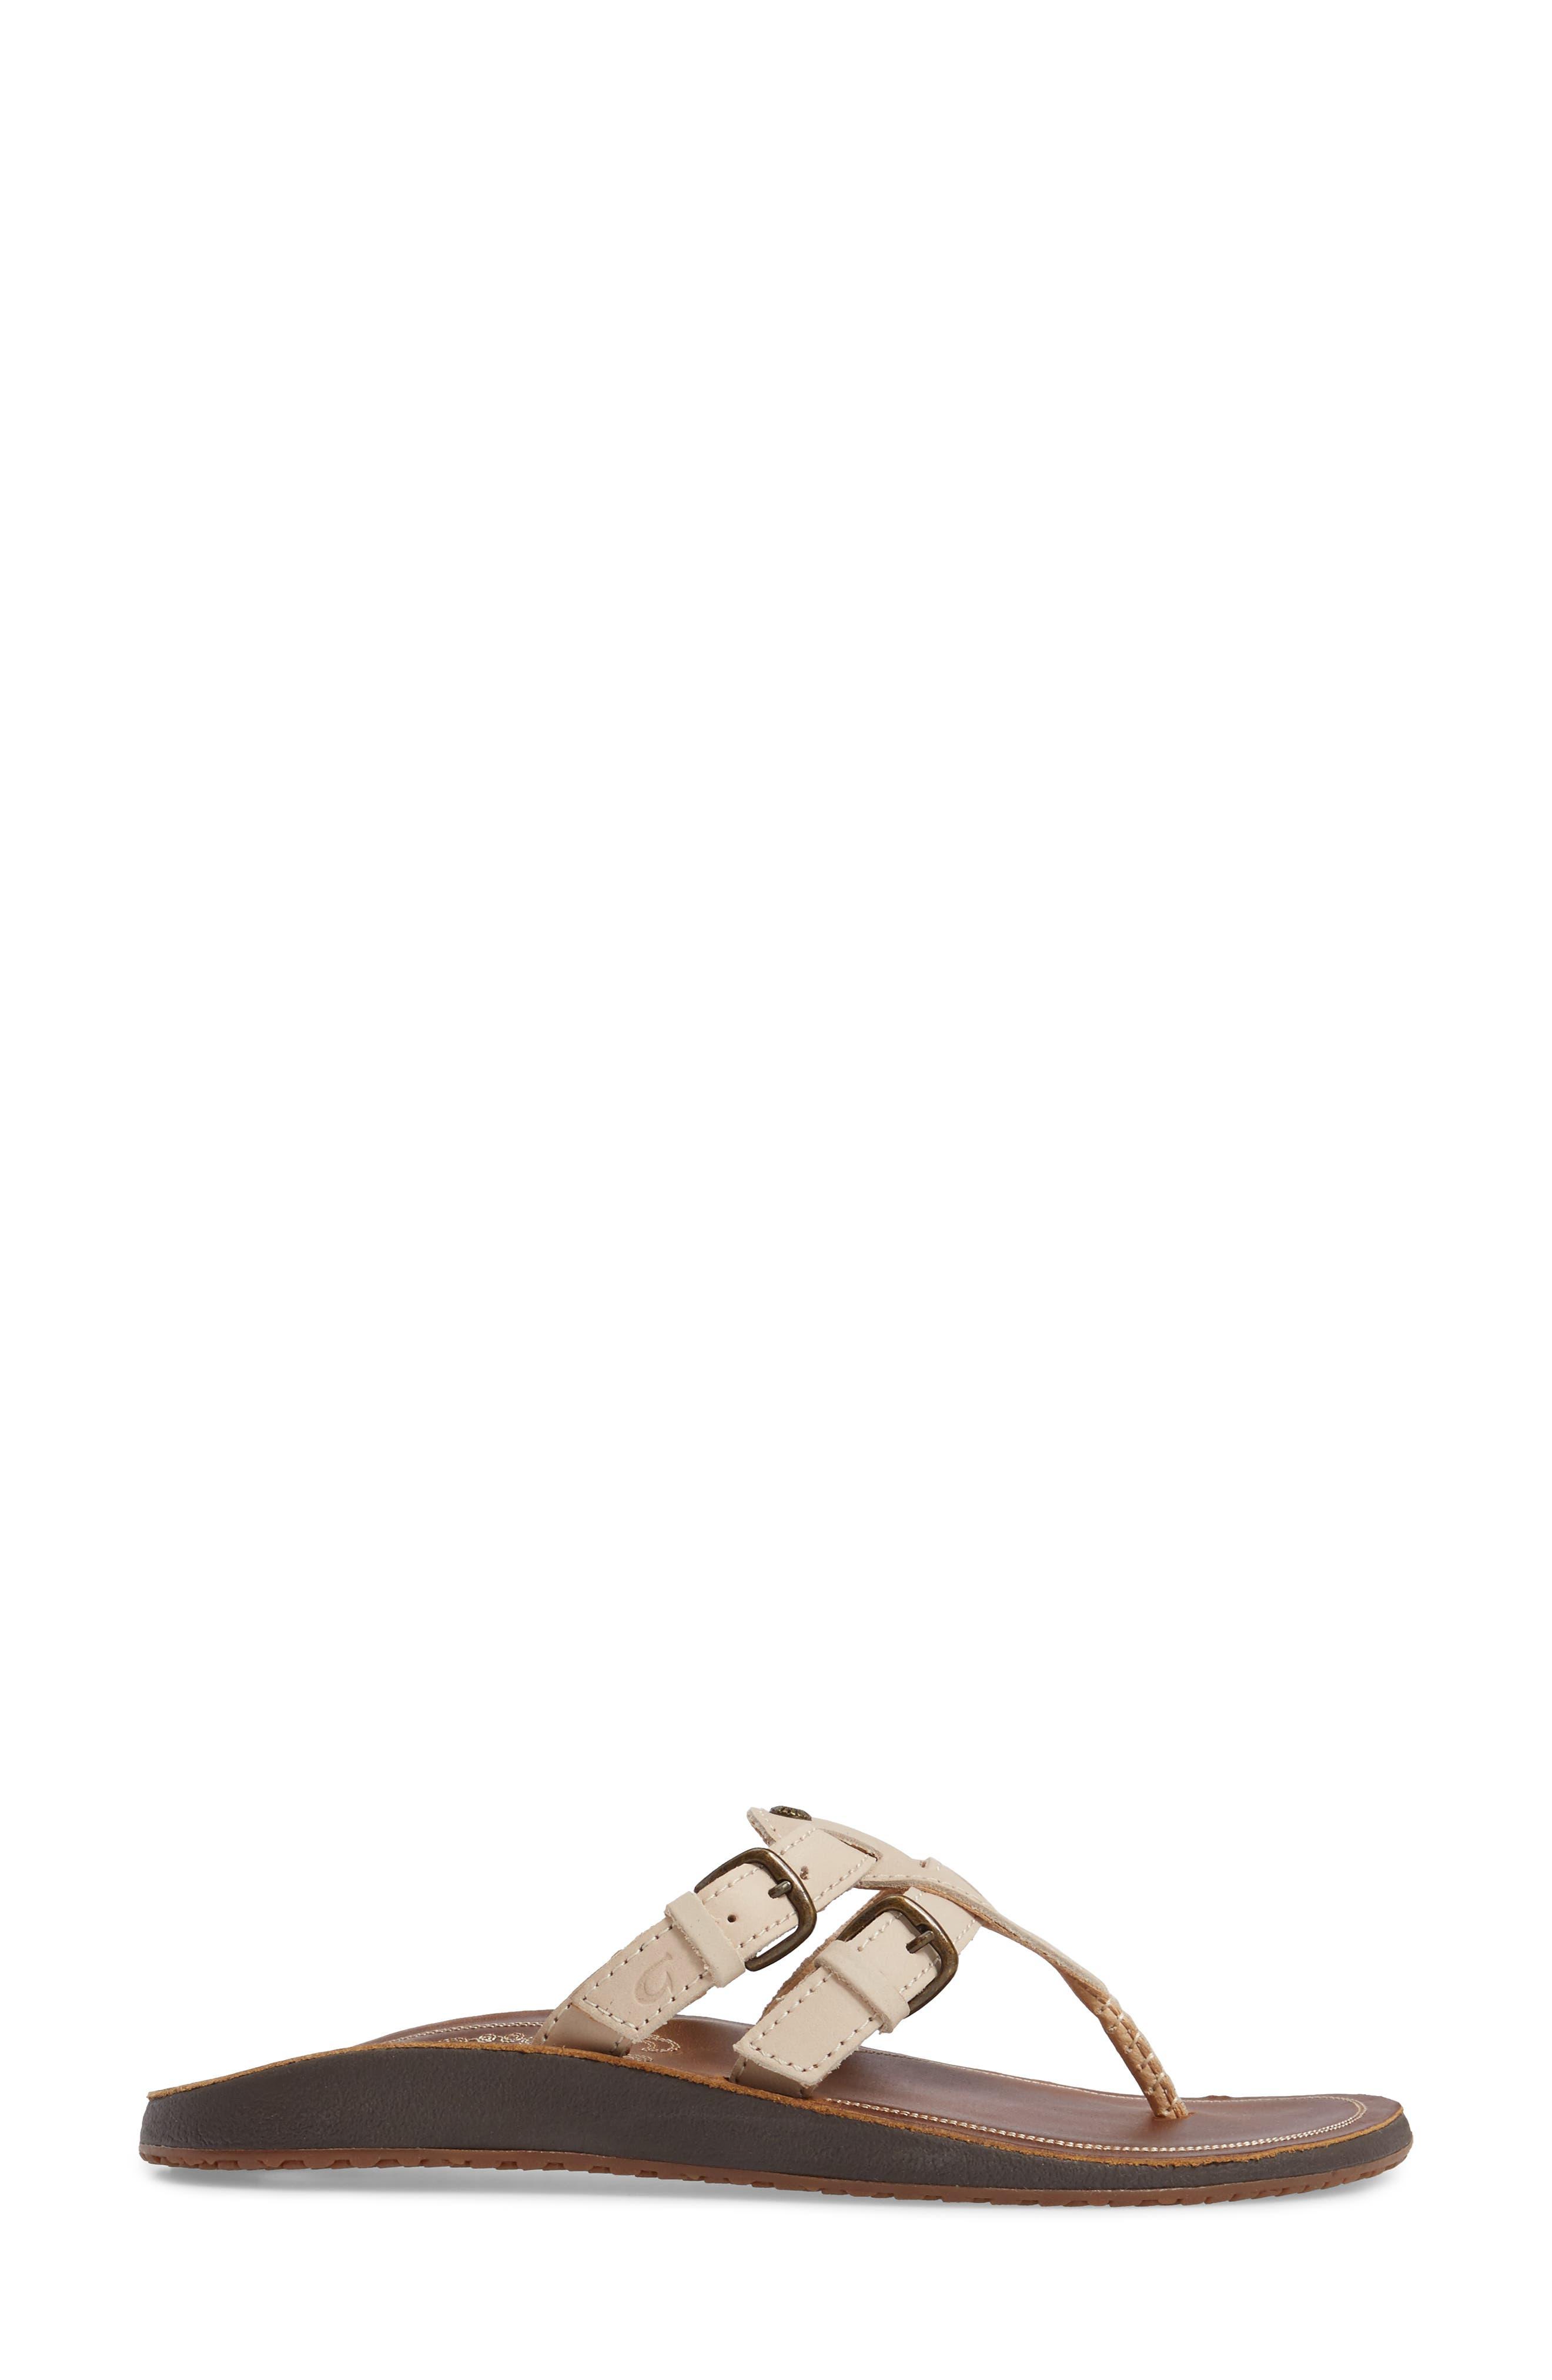 Honoka'a Buckle Flip Flop,                             Alternate thumbnail 3, color,                             Tapa/ Sahara Leather